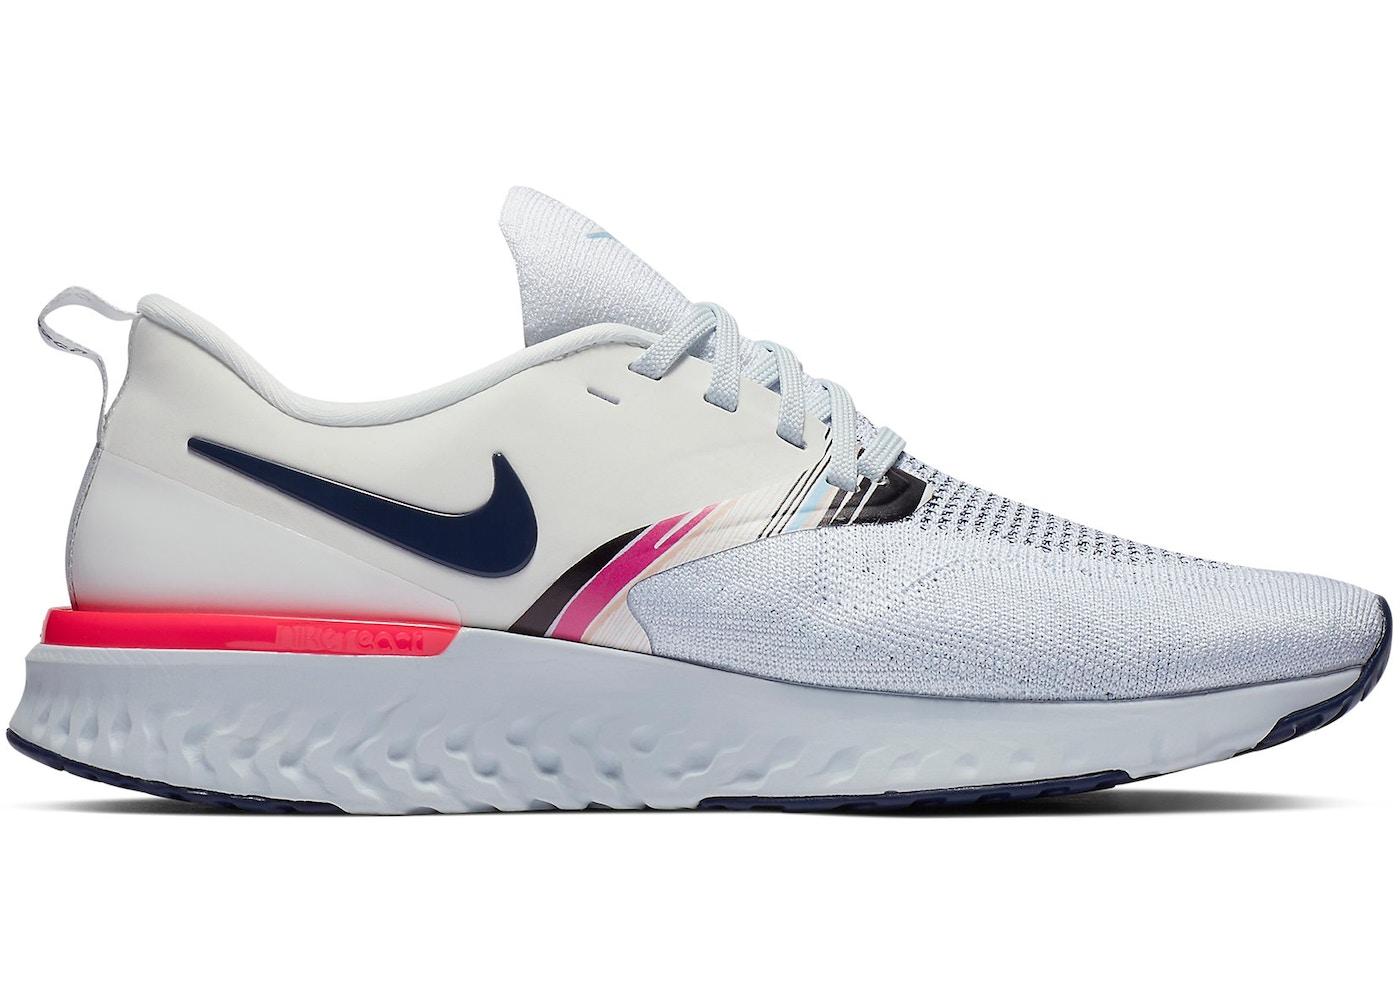 20857f49c9411 Nike Odyssey React 2 Flyknit White Blue Void Hyper Pink (W) - AV2608-146